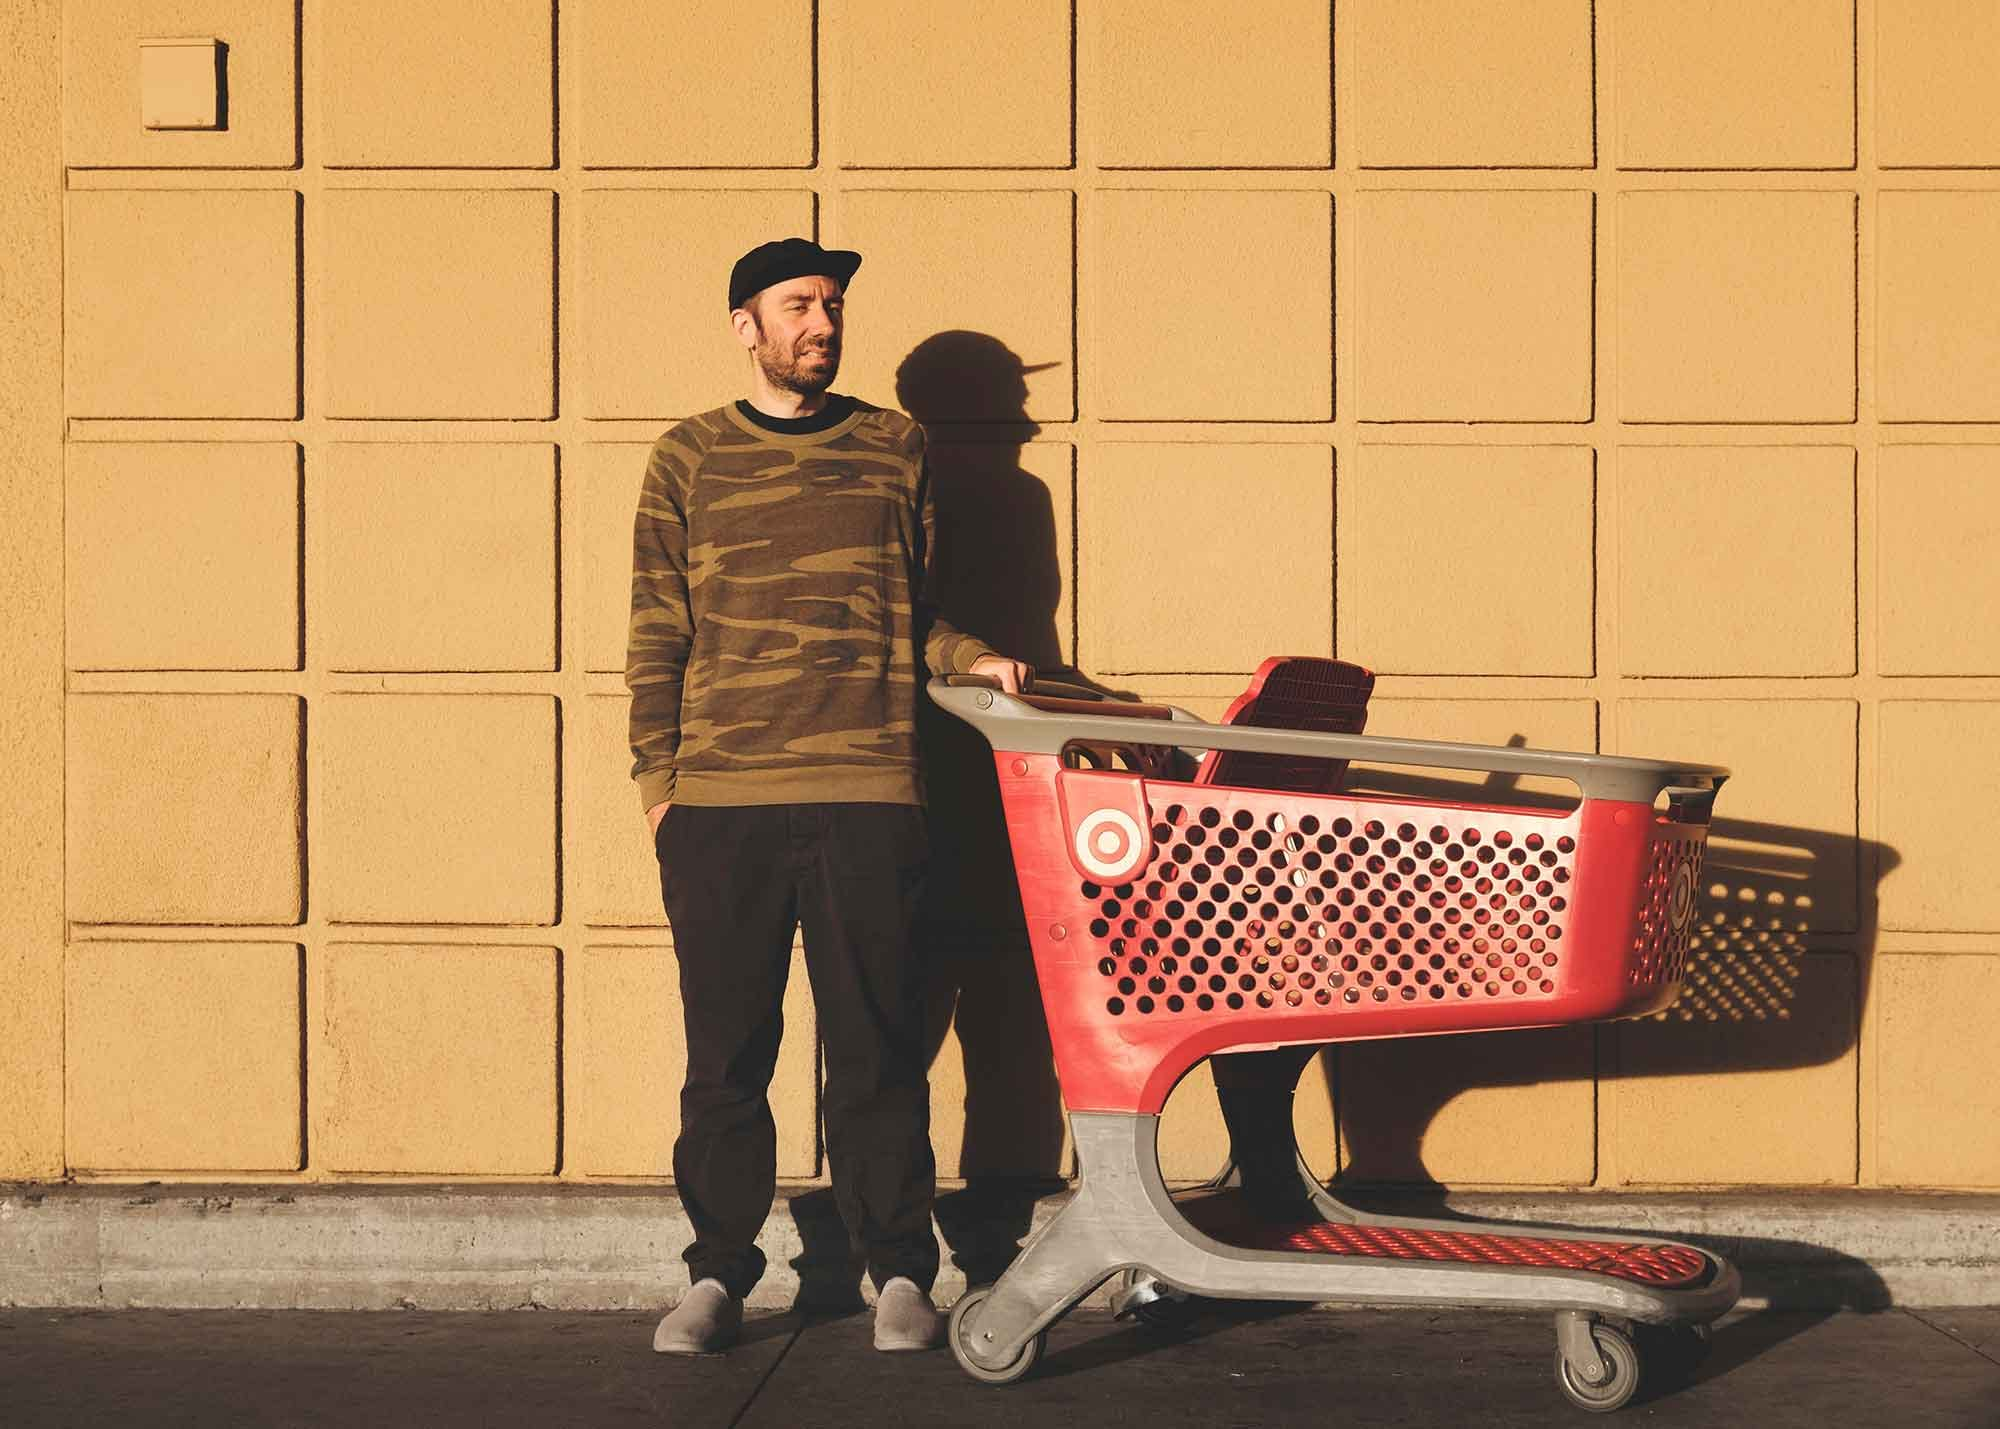 Yuppie pushing a Target cart